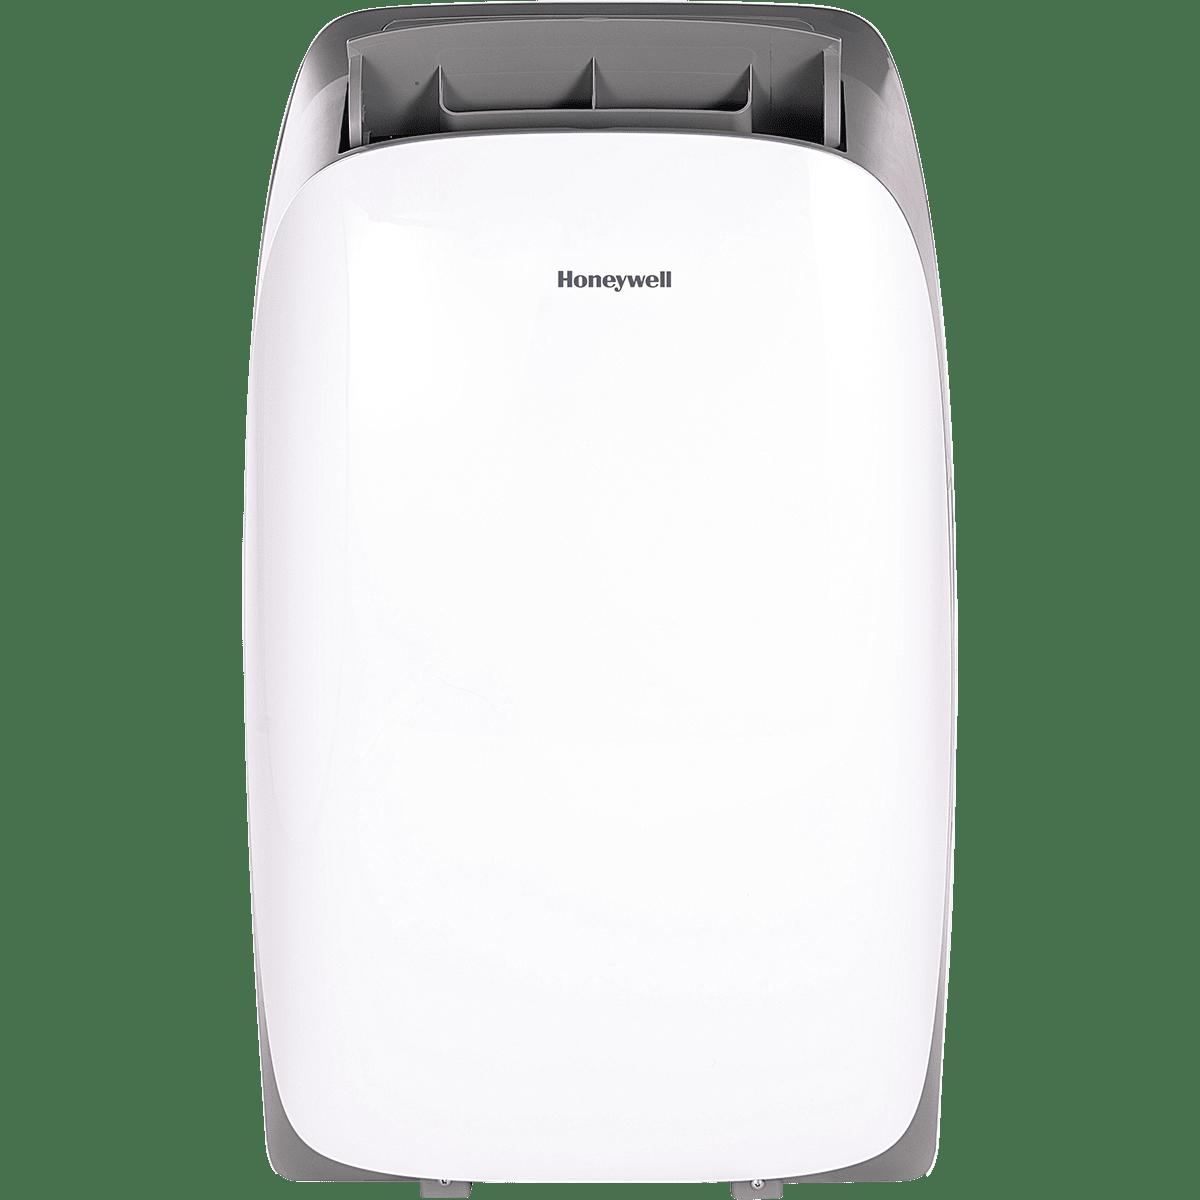 Honeywell HL Series 10,000 BTU Portable Air Conditioners ho5469